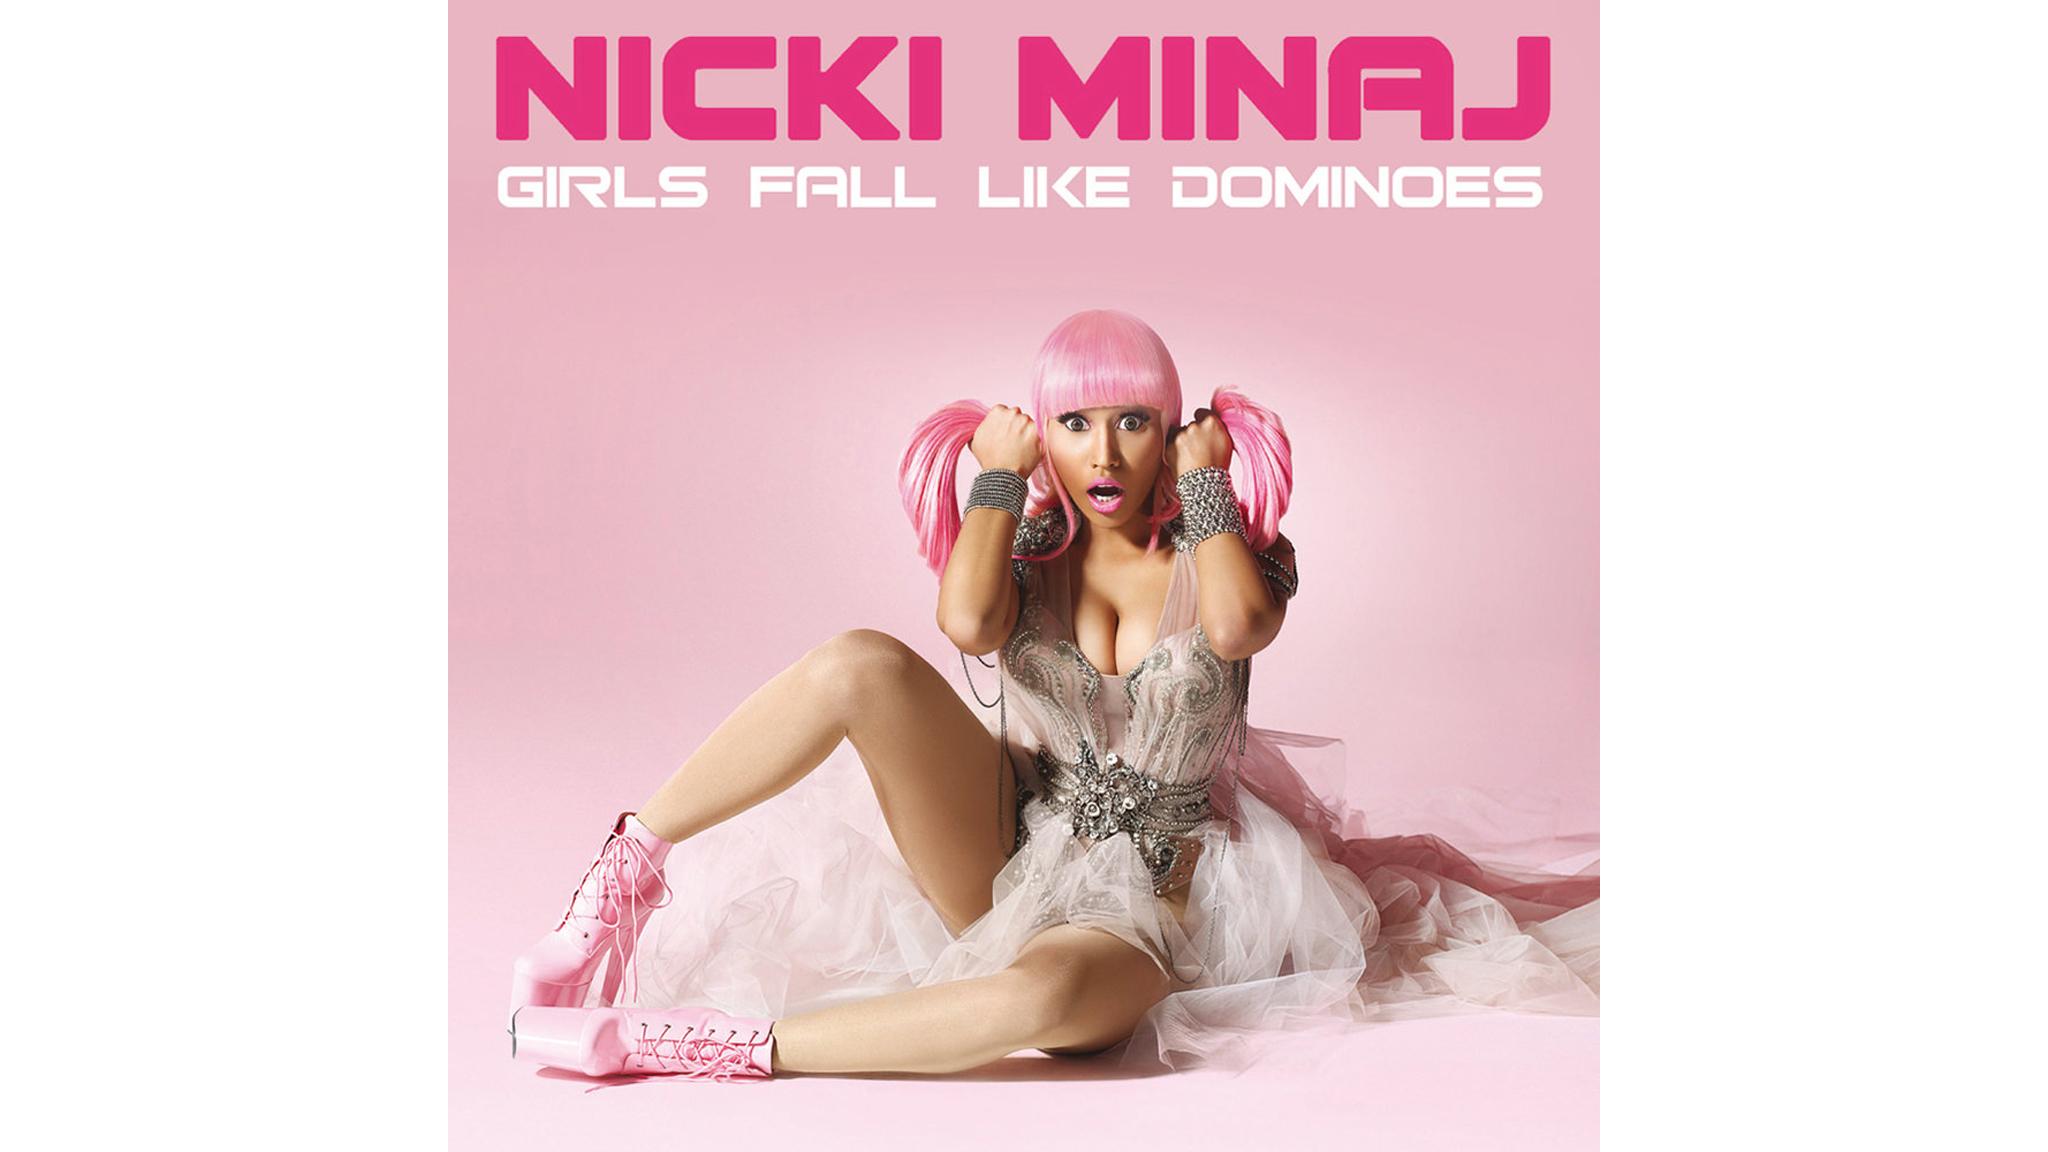 girls fall like dominoes, nicki minaj